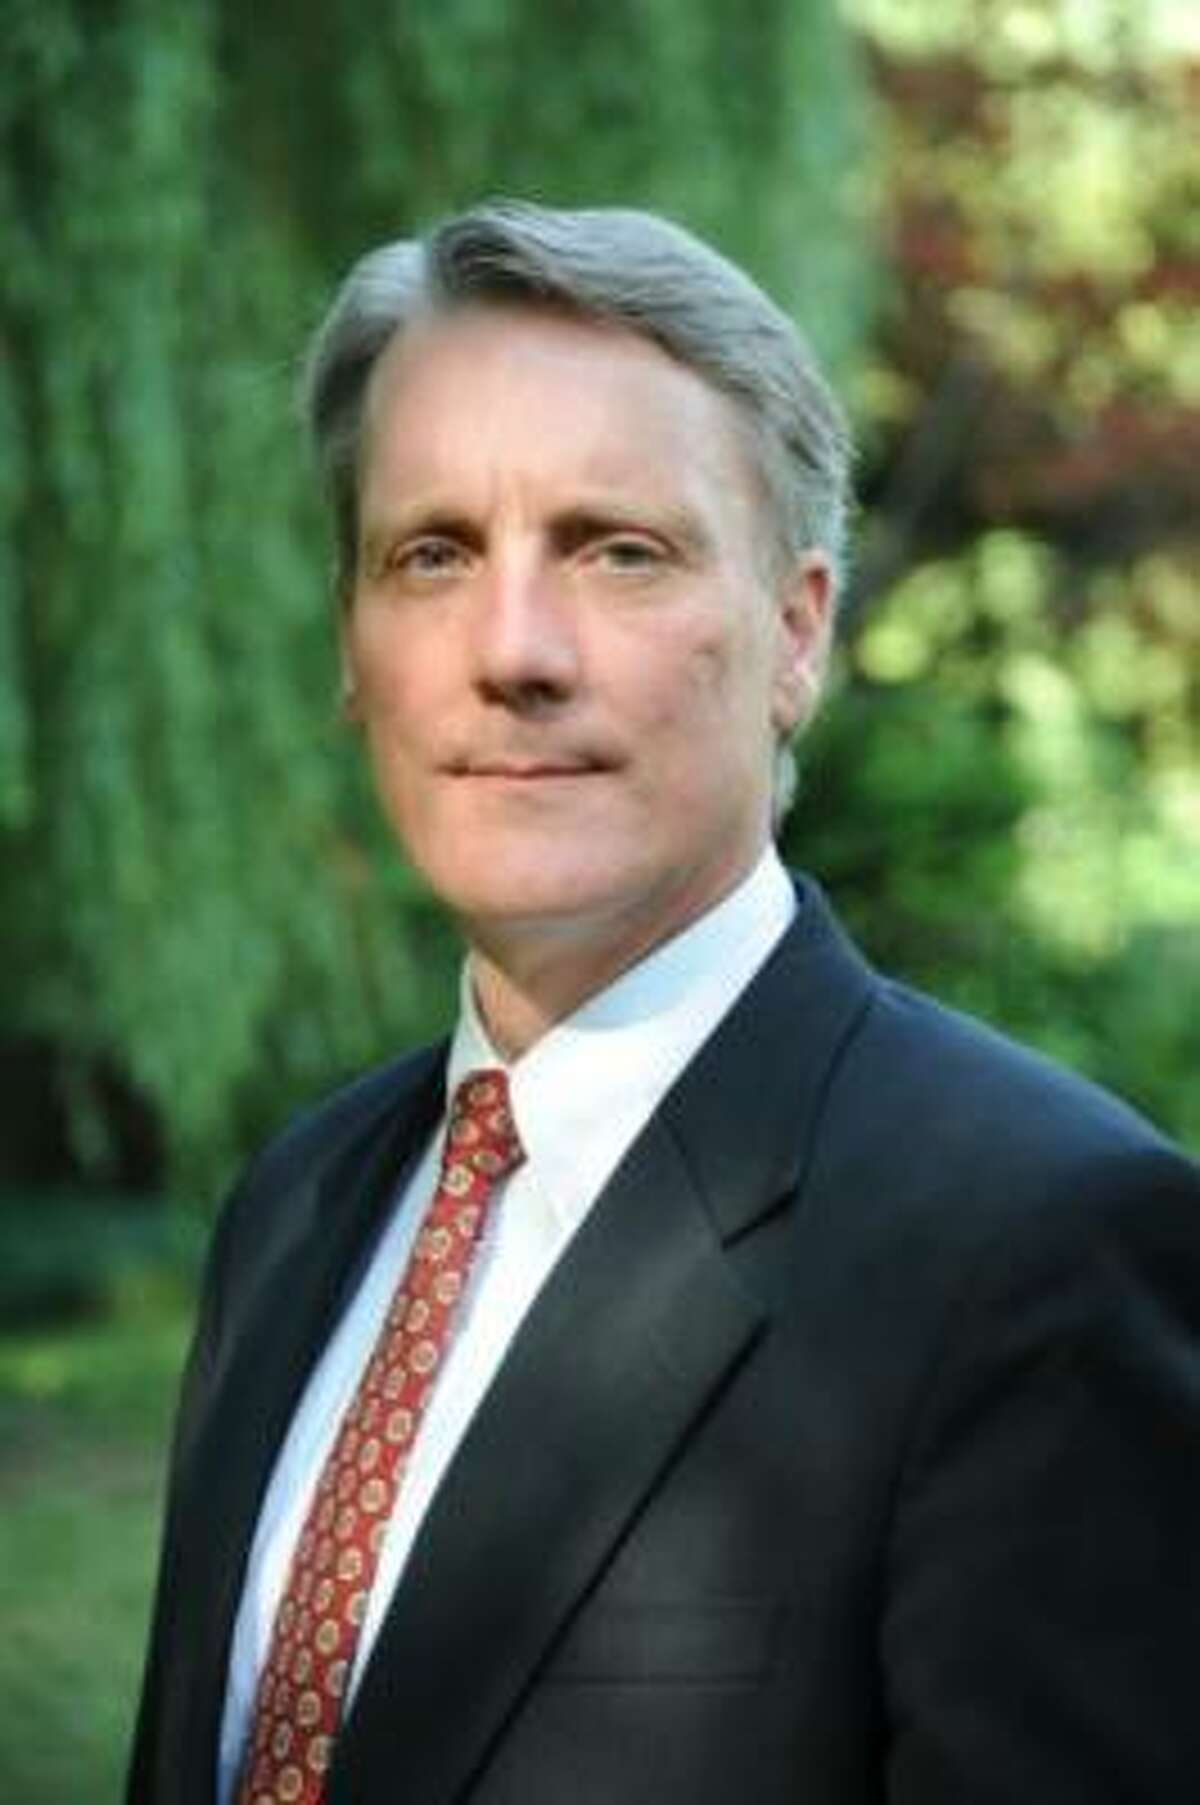 Bruce Boissonnault president of Niagara Health Quality Coalition in Williamsville, N.Y.